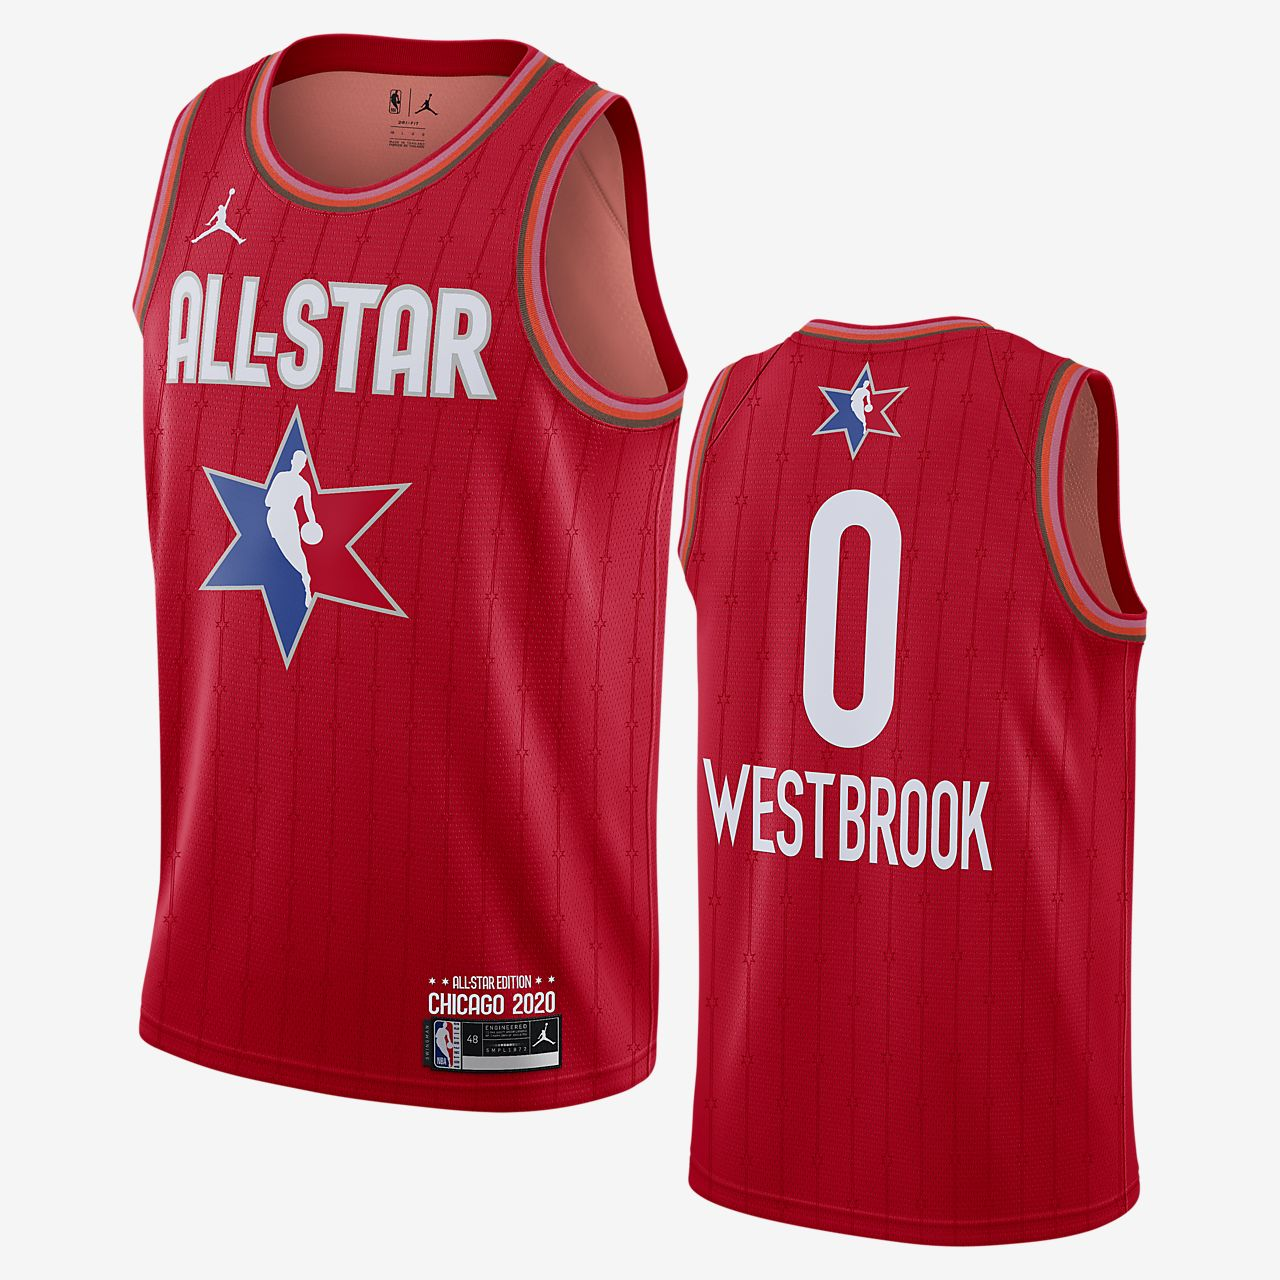 Maillot Jordan NBA Swingman Russell Westbrook All Star